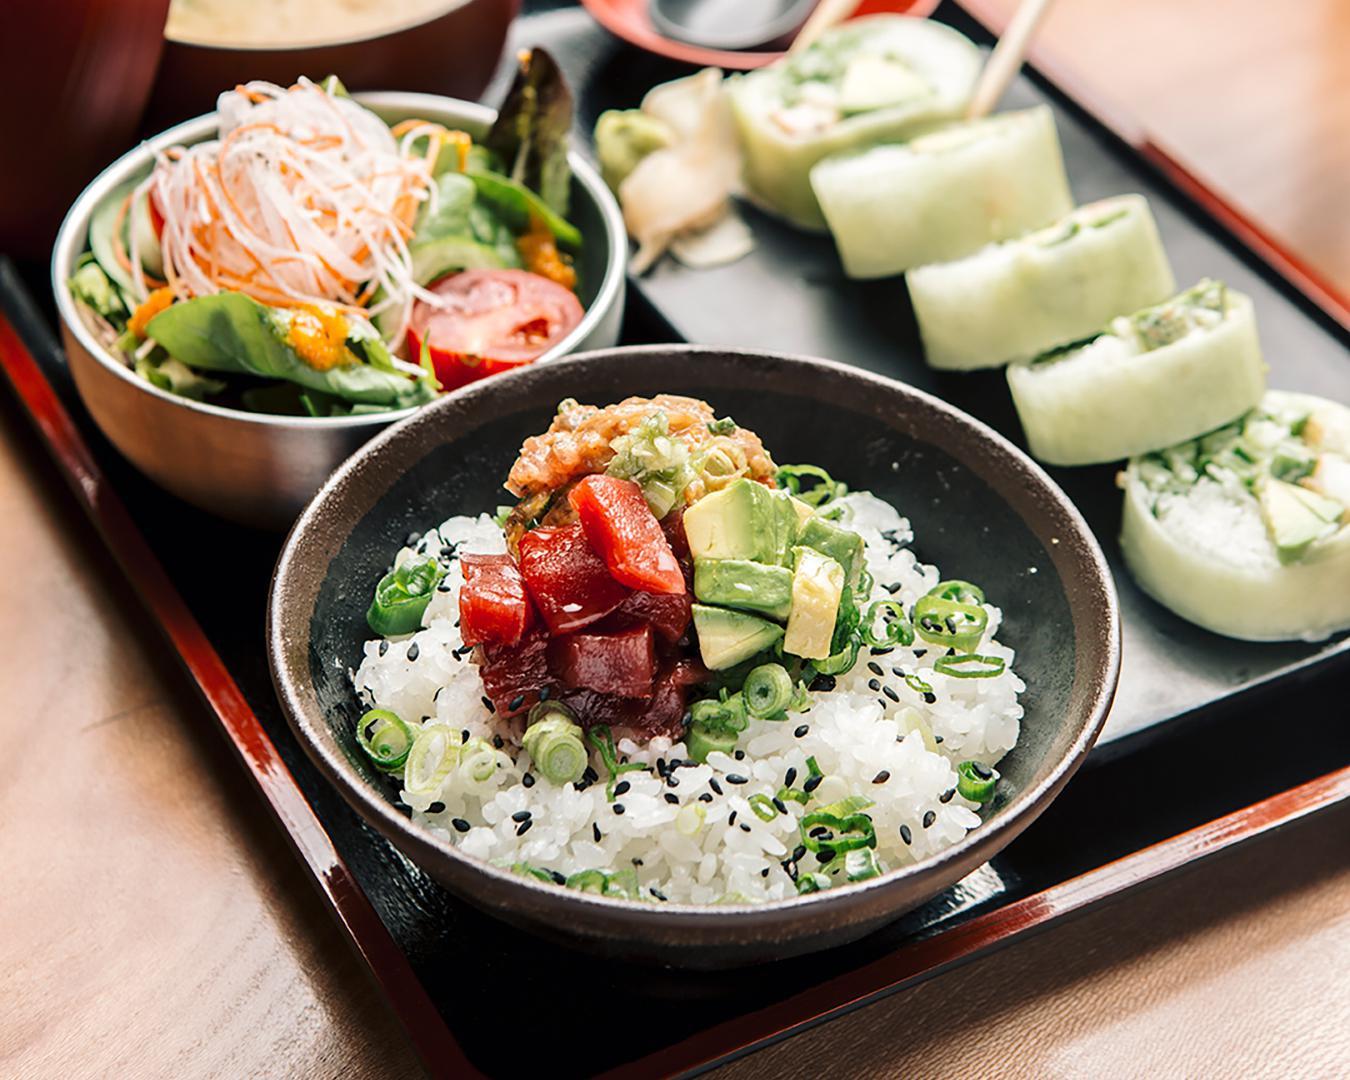 raw tuna and avocado